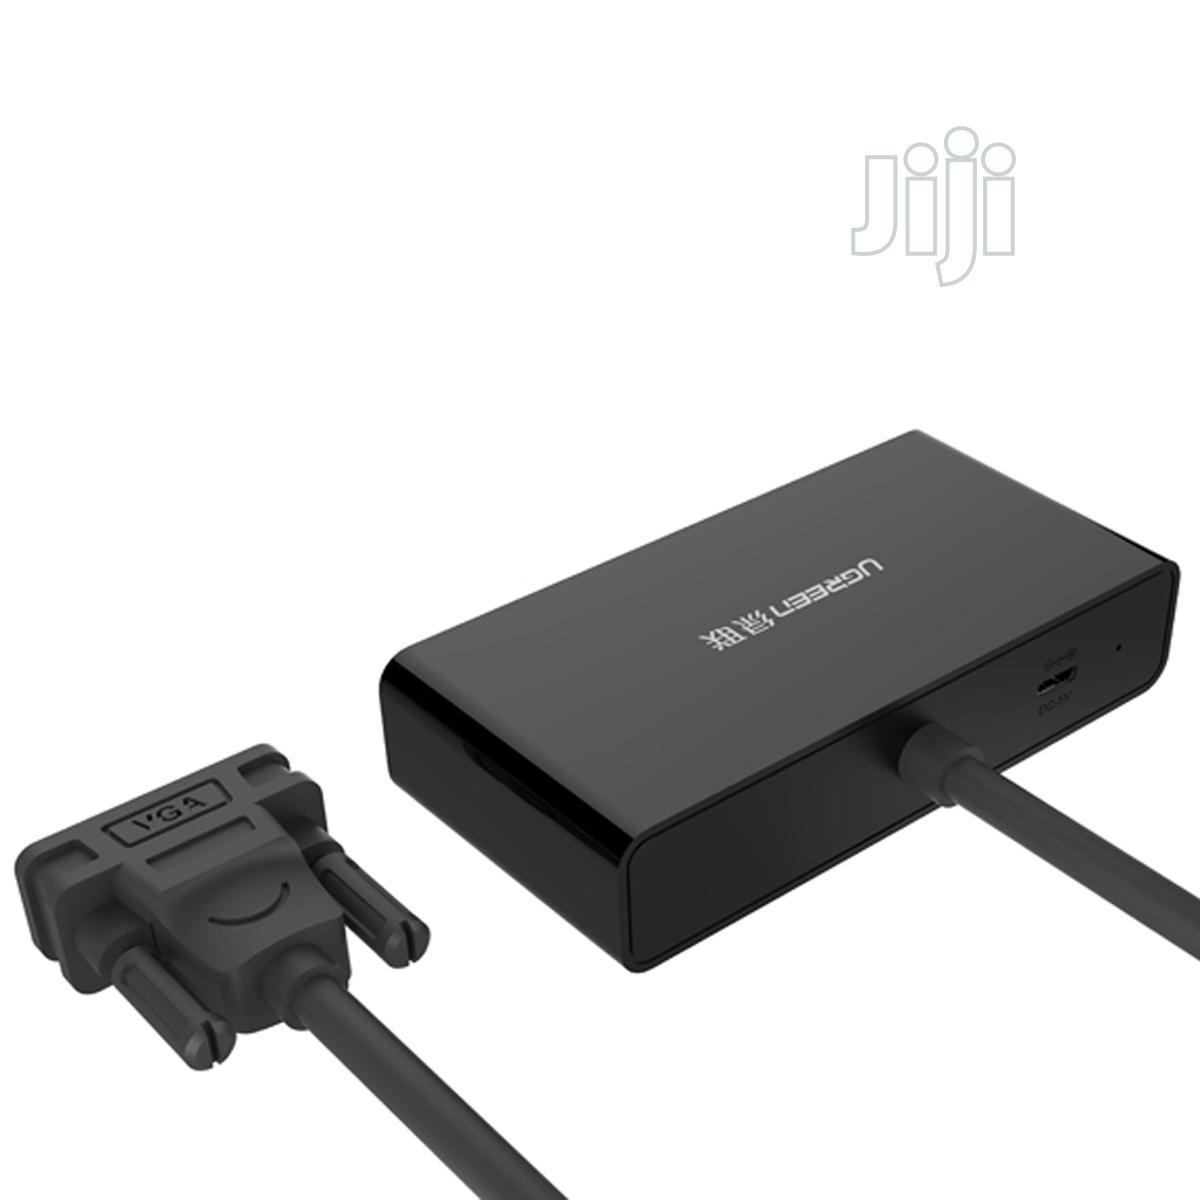 VGA Male To 2 Female Video Splitter Cable : 40254